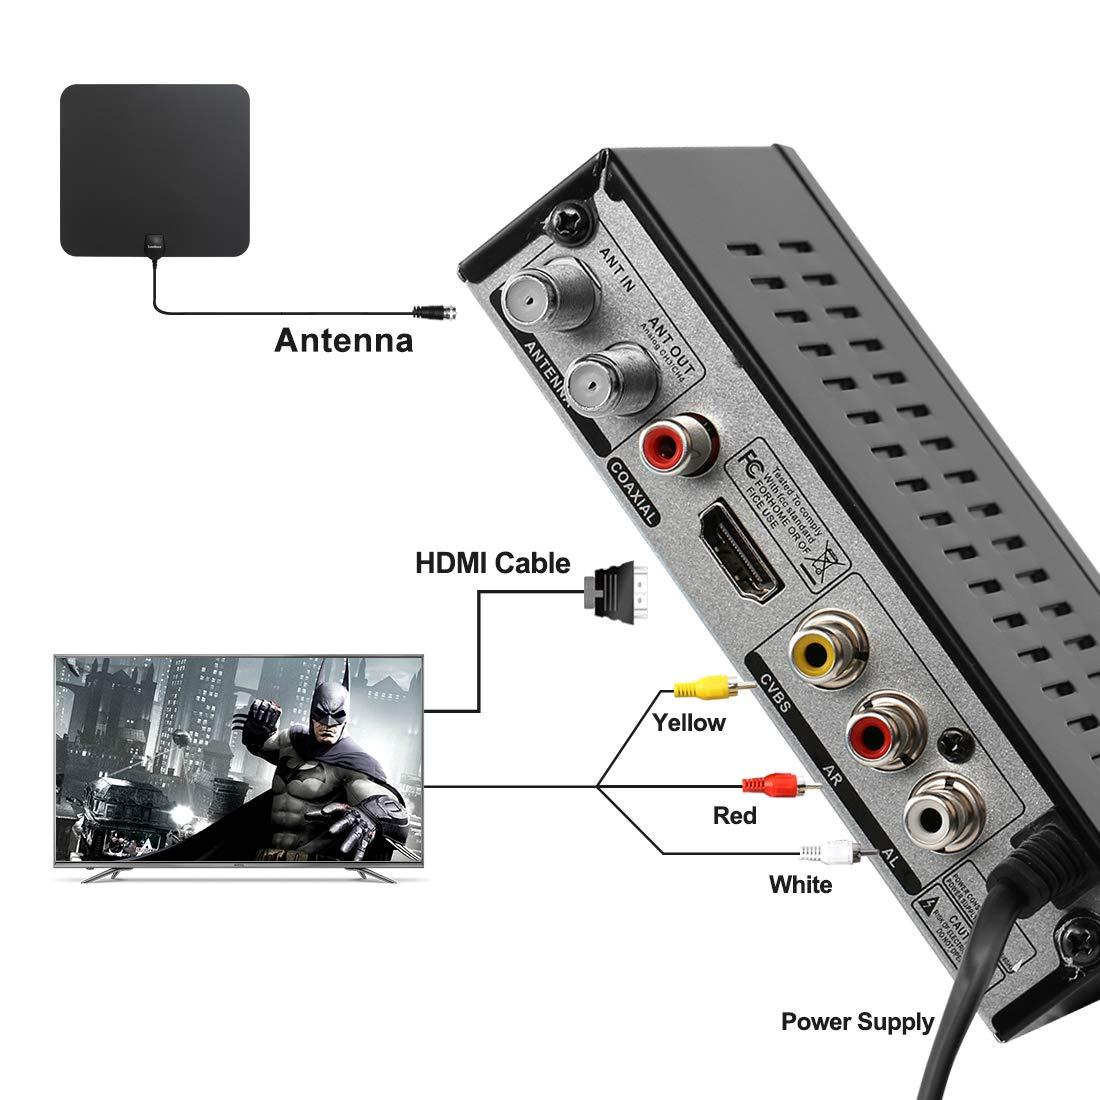 Pause Live TV Multimedia Playback HDTV Set Top Box Leelbox Digital ...